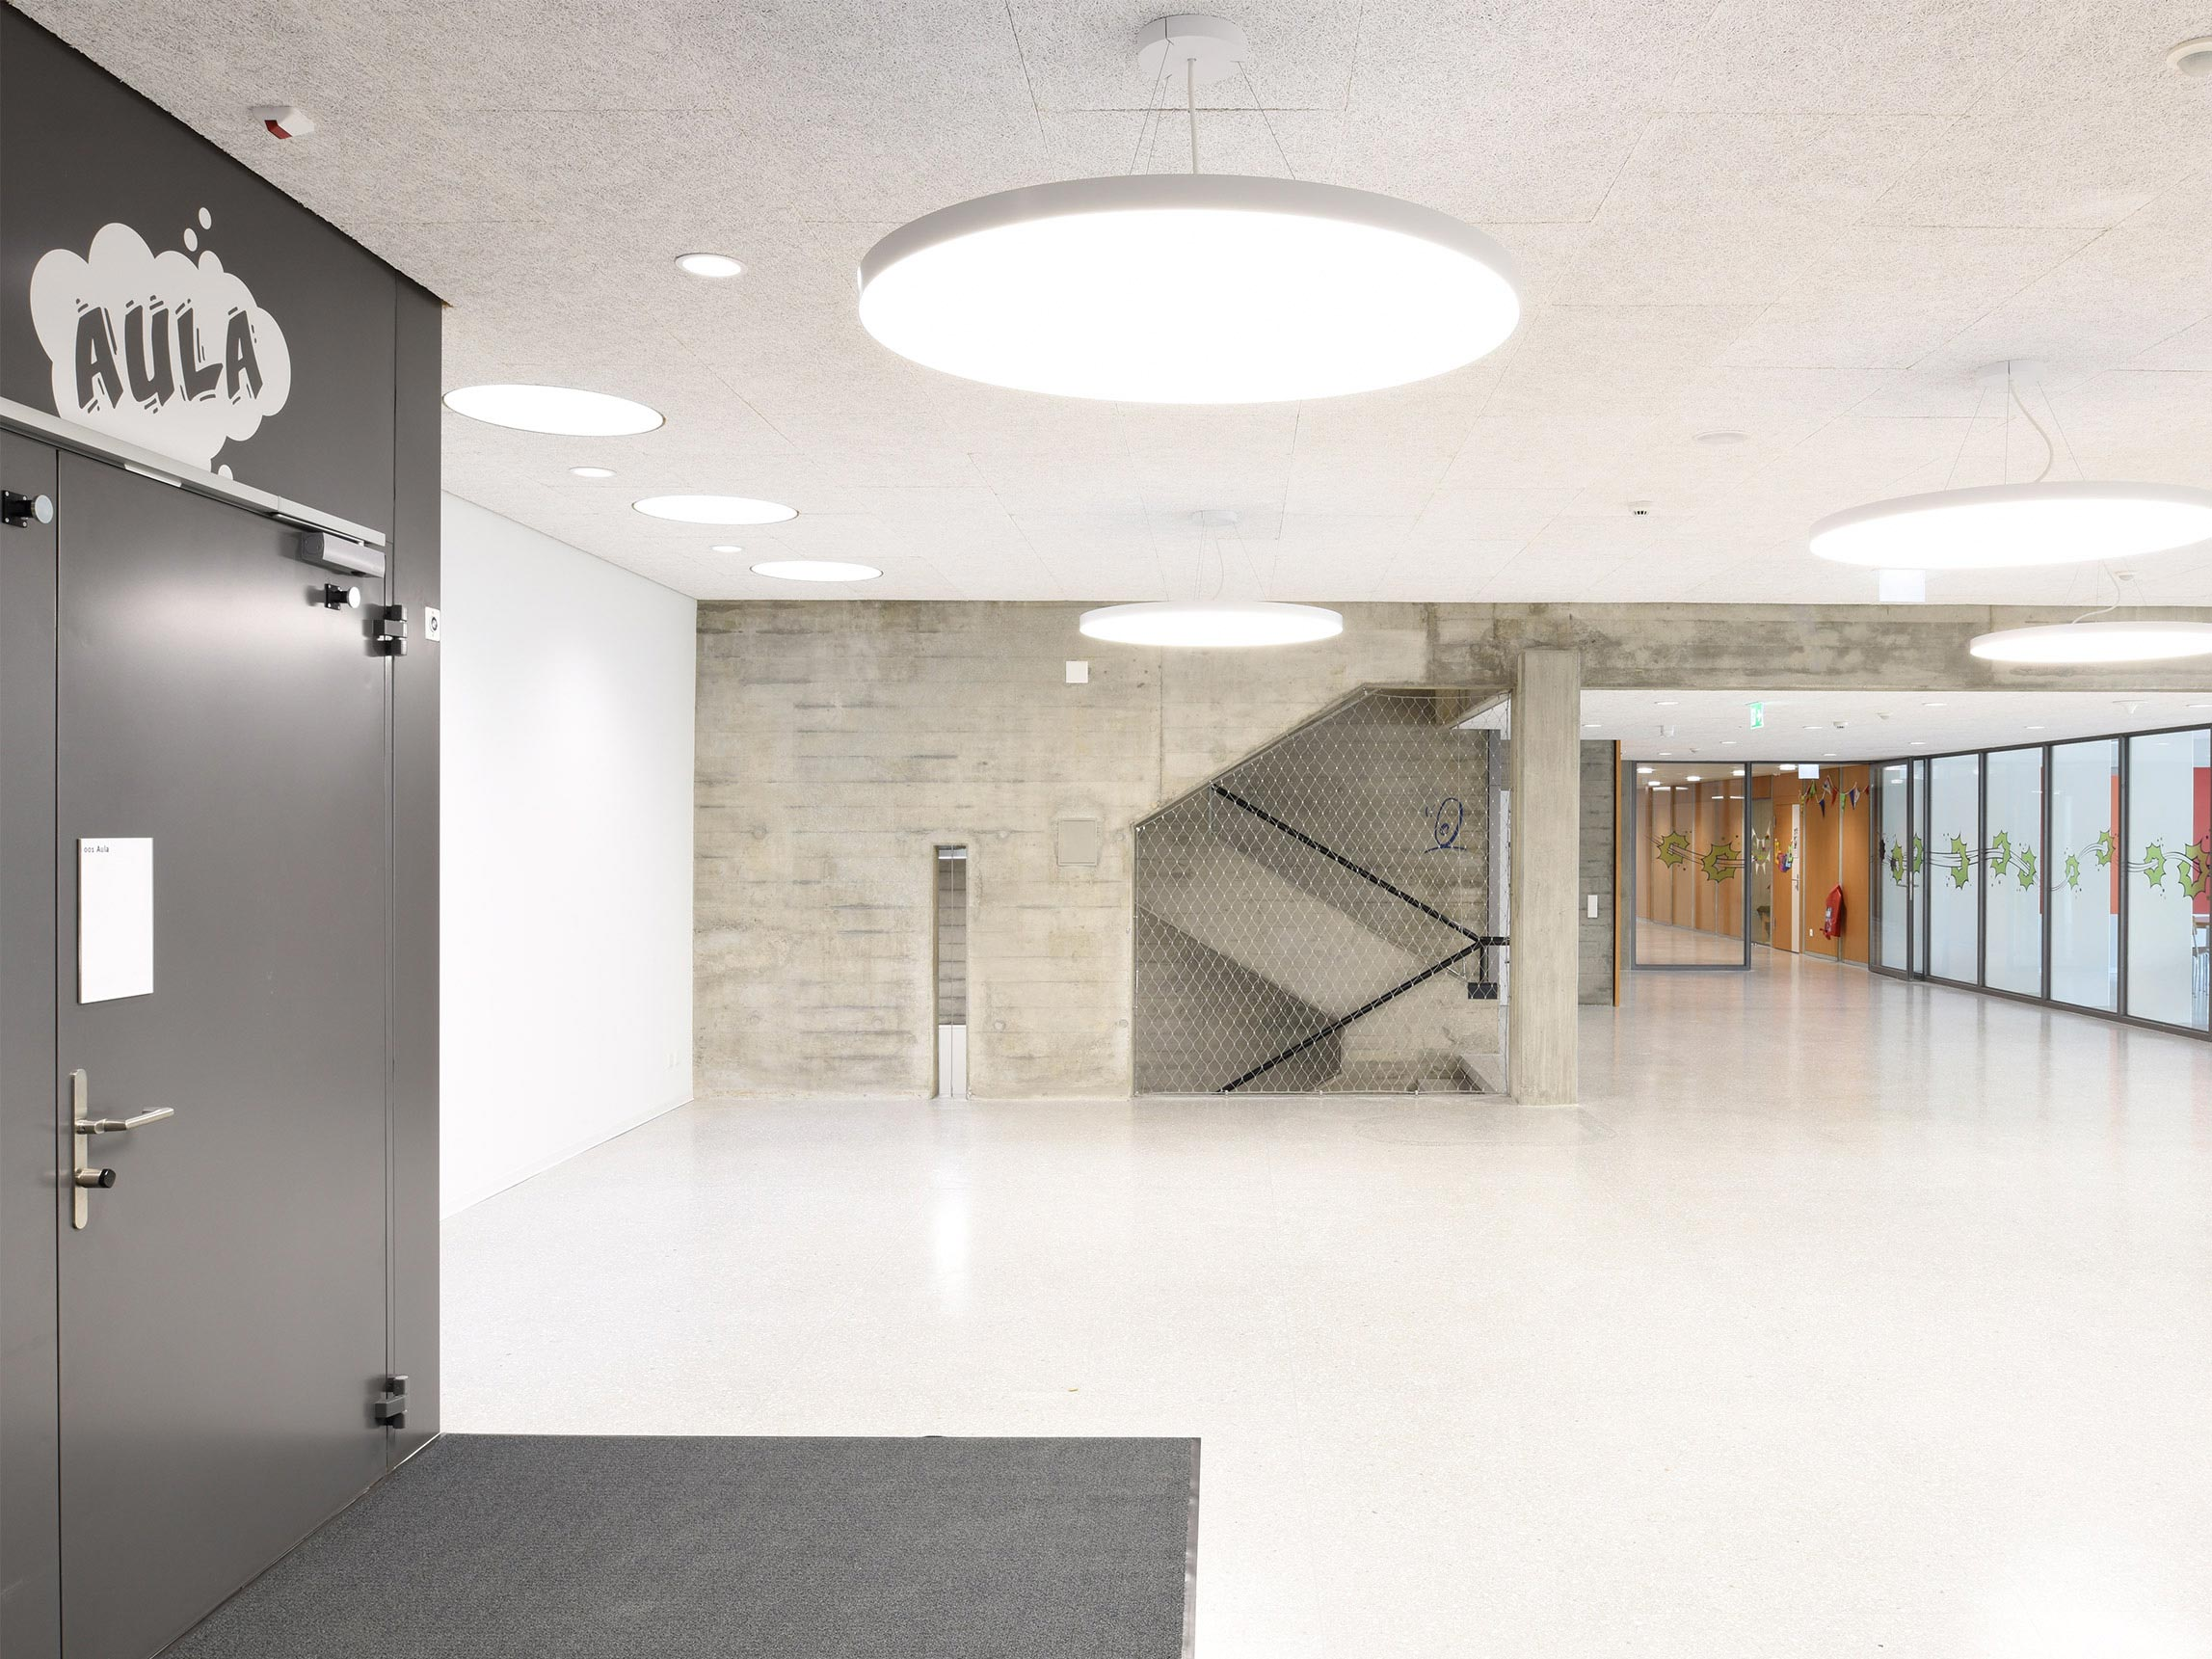 Aula Schule Wankdorf Signaletik